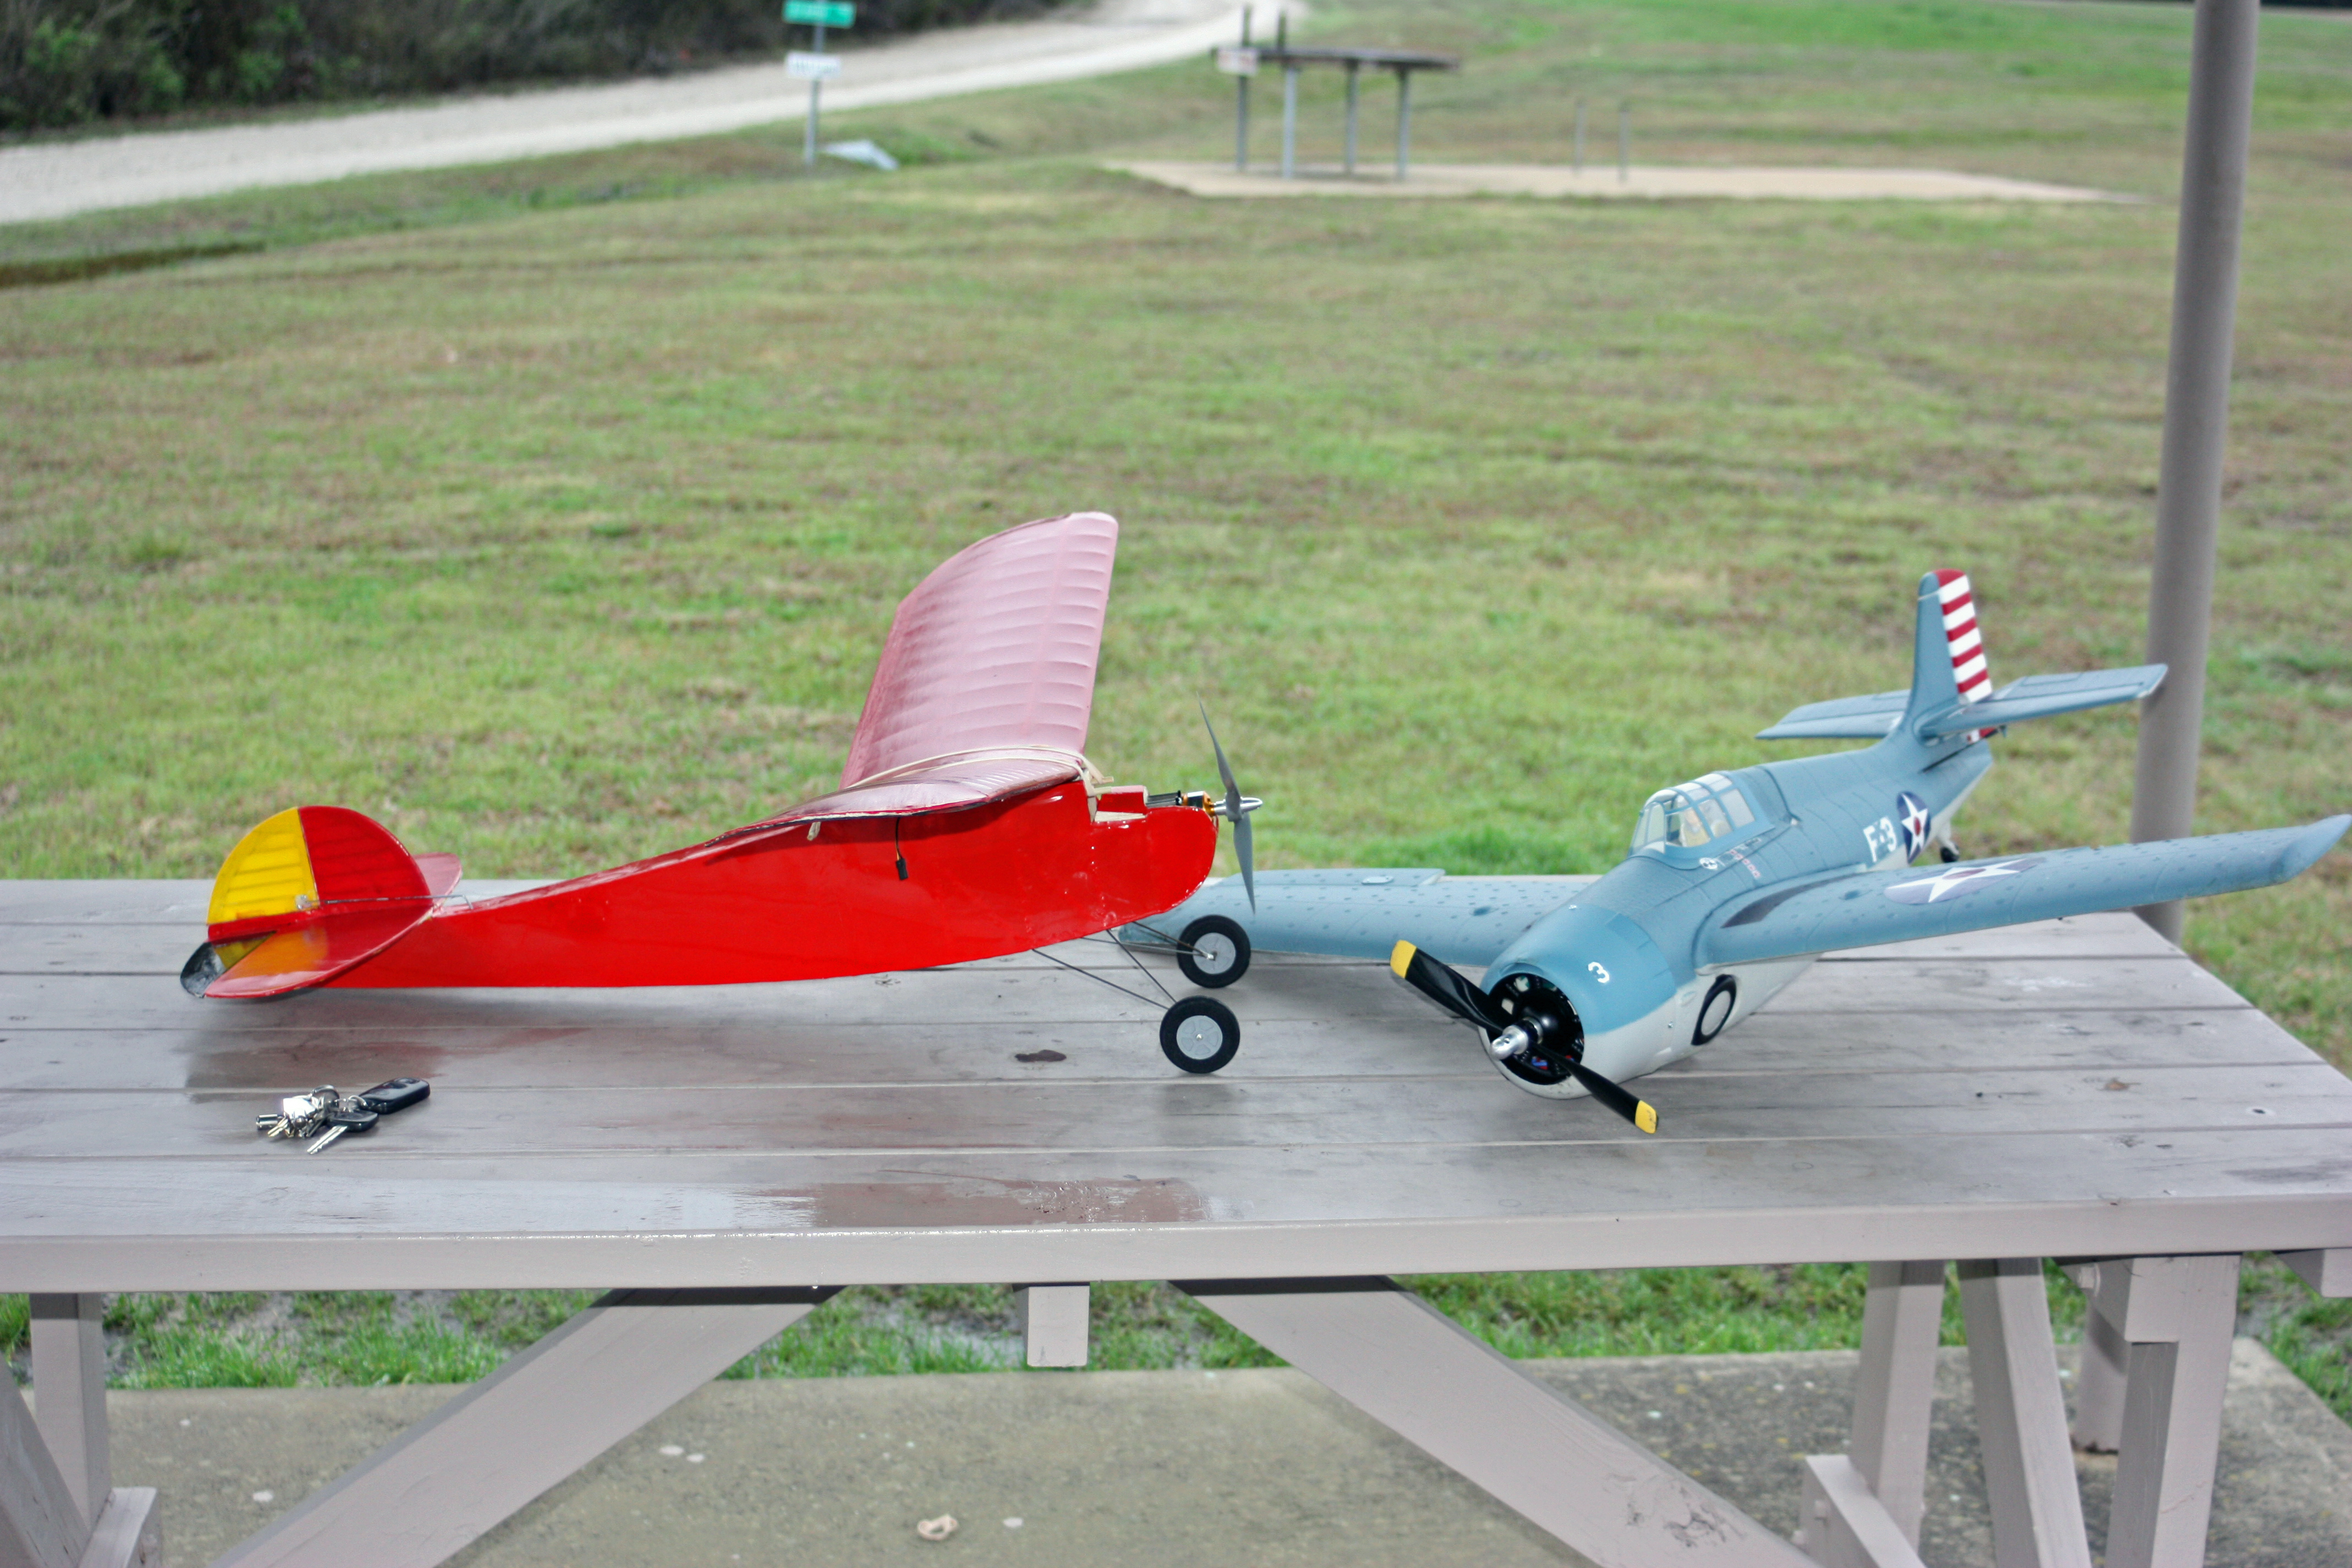 063 Demo Plane-3.JPG